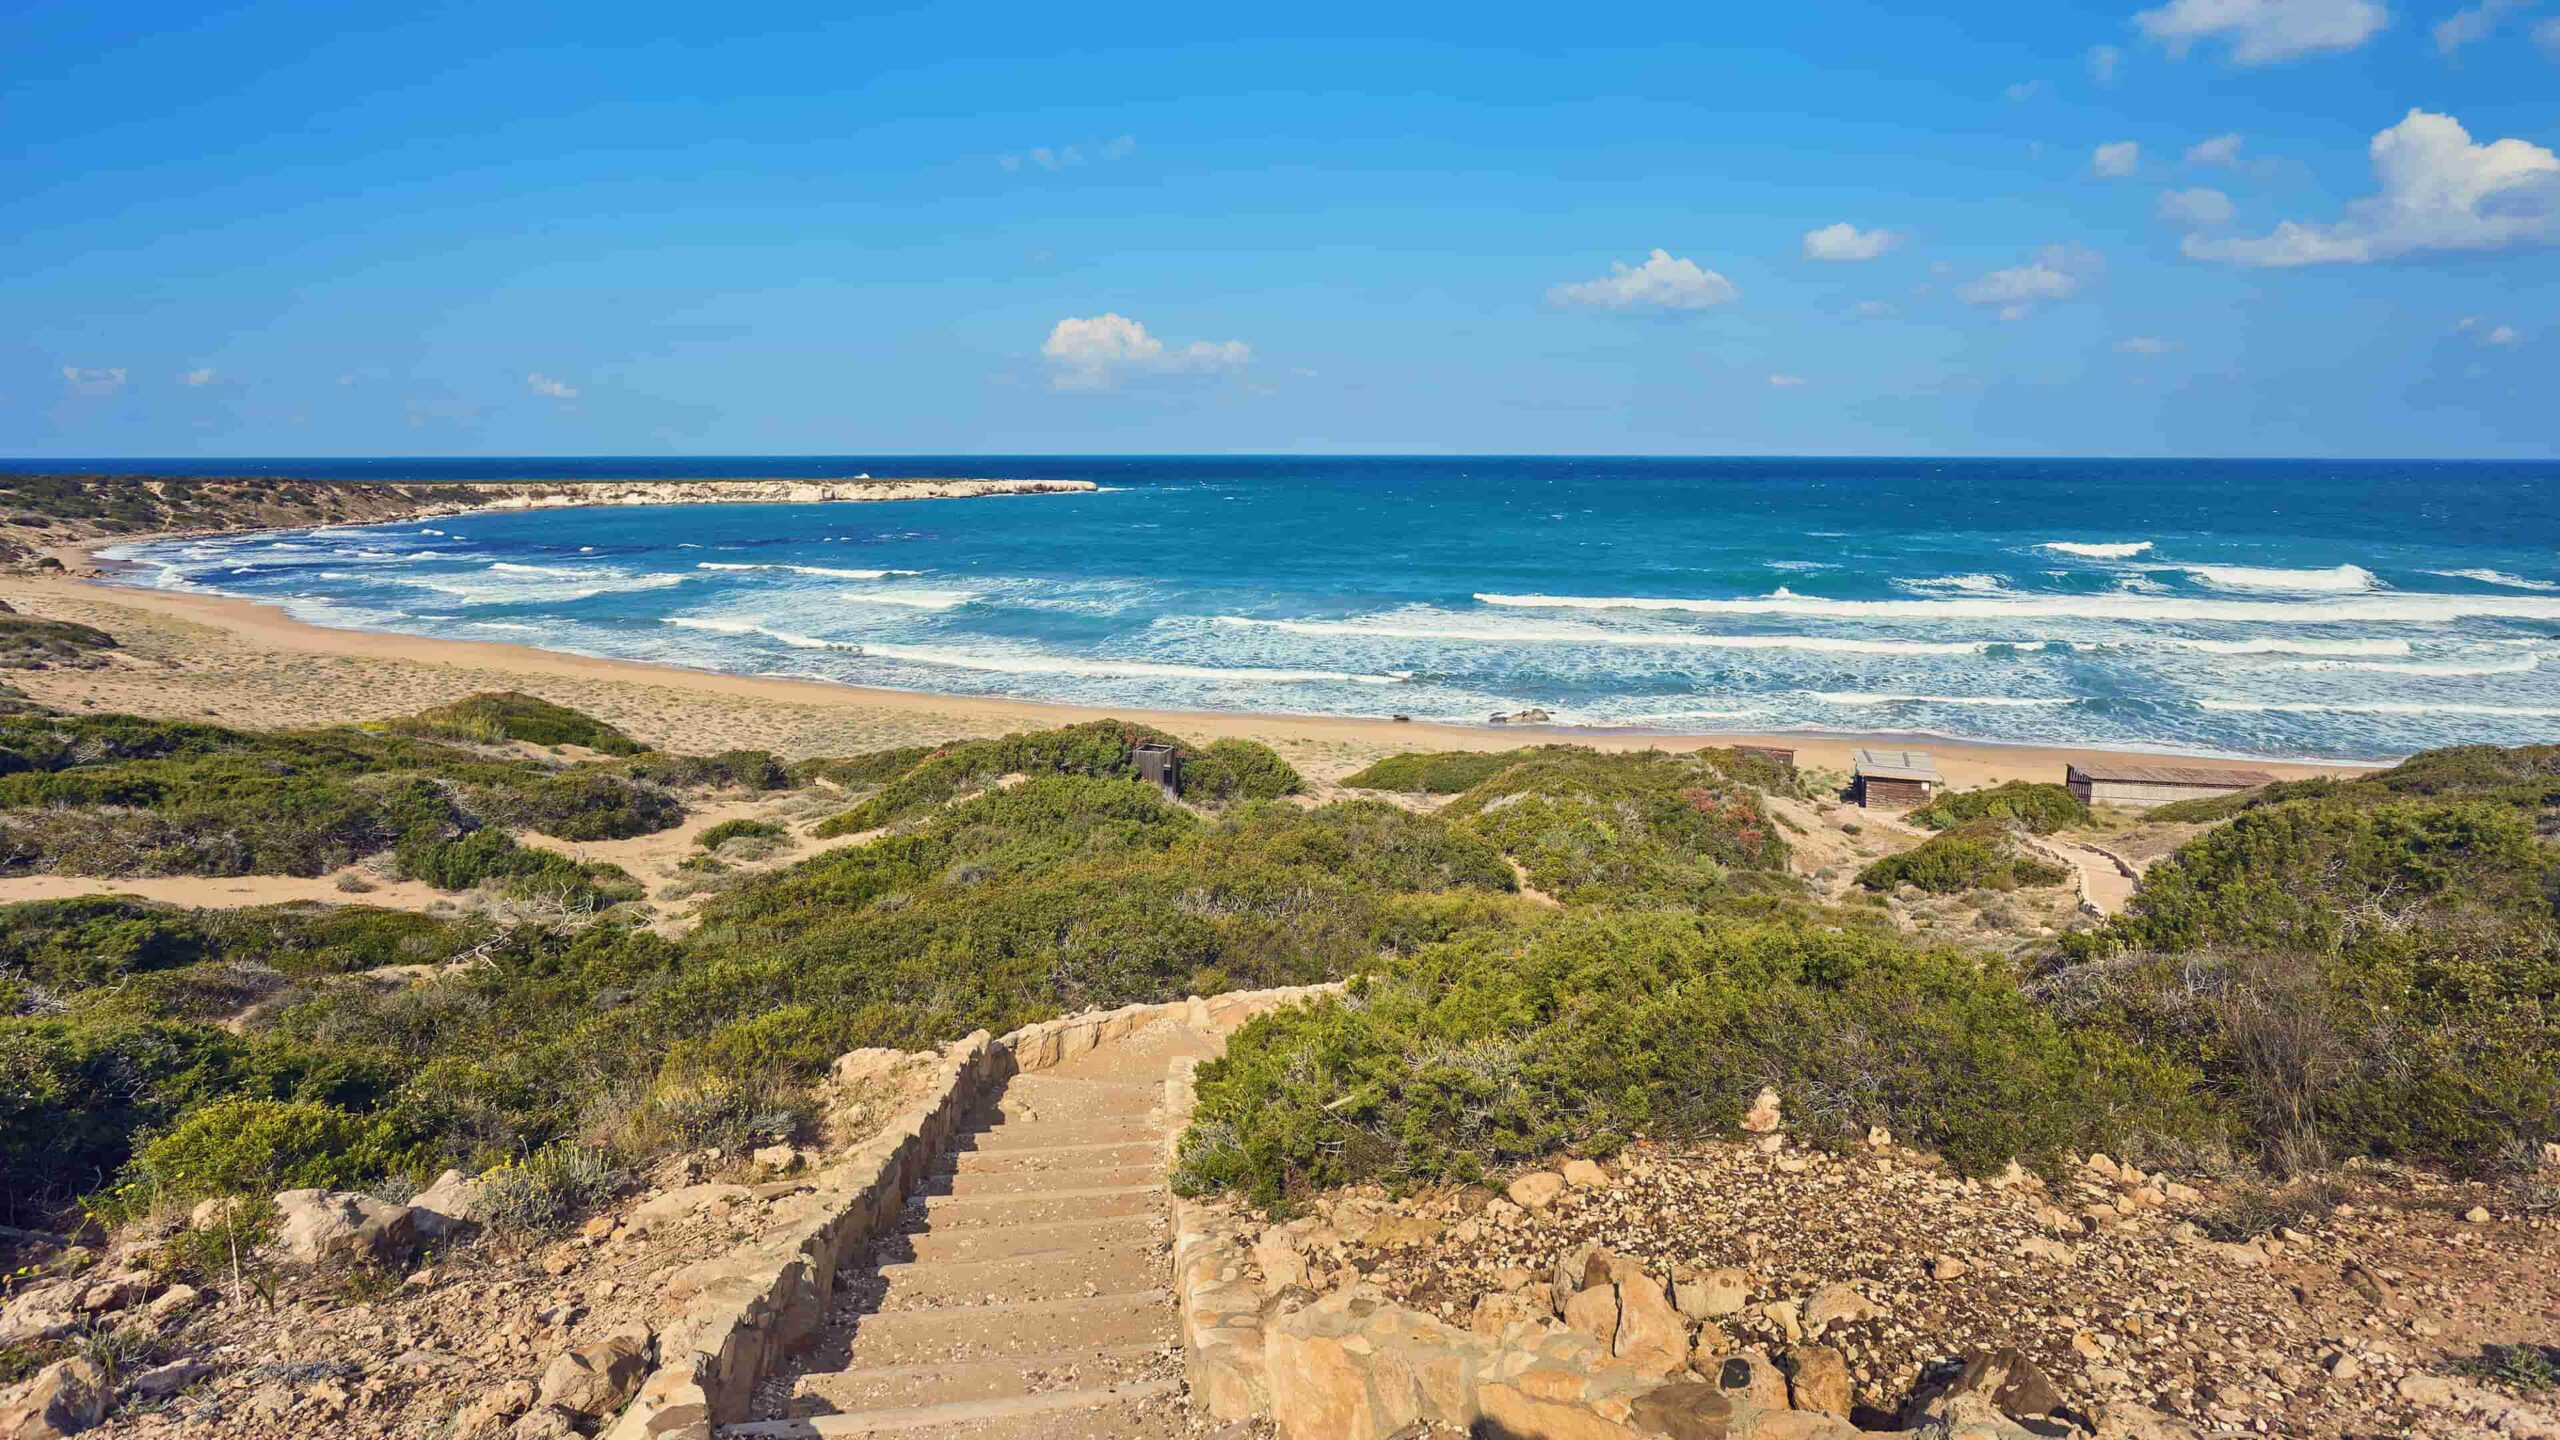 Cyprus Lara Beach